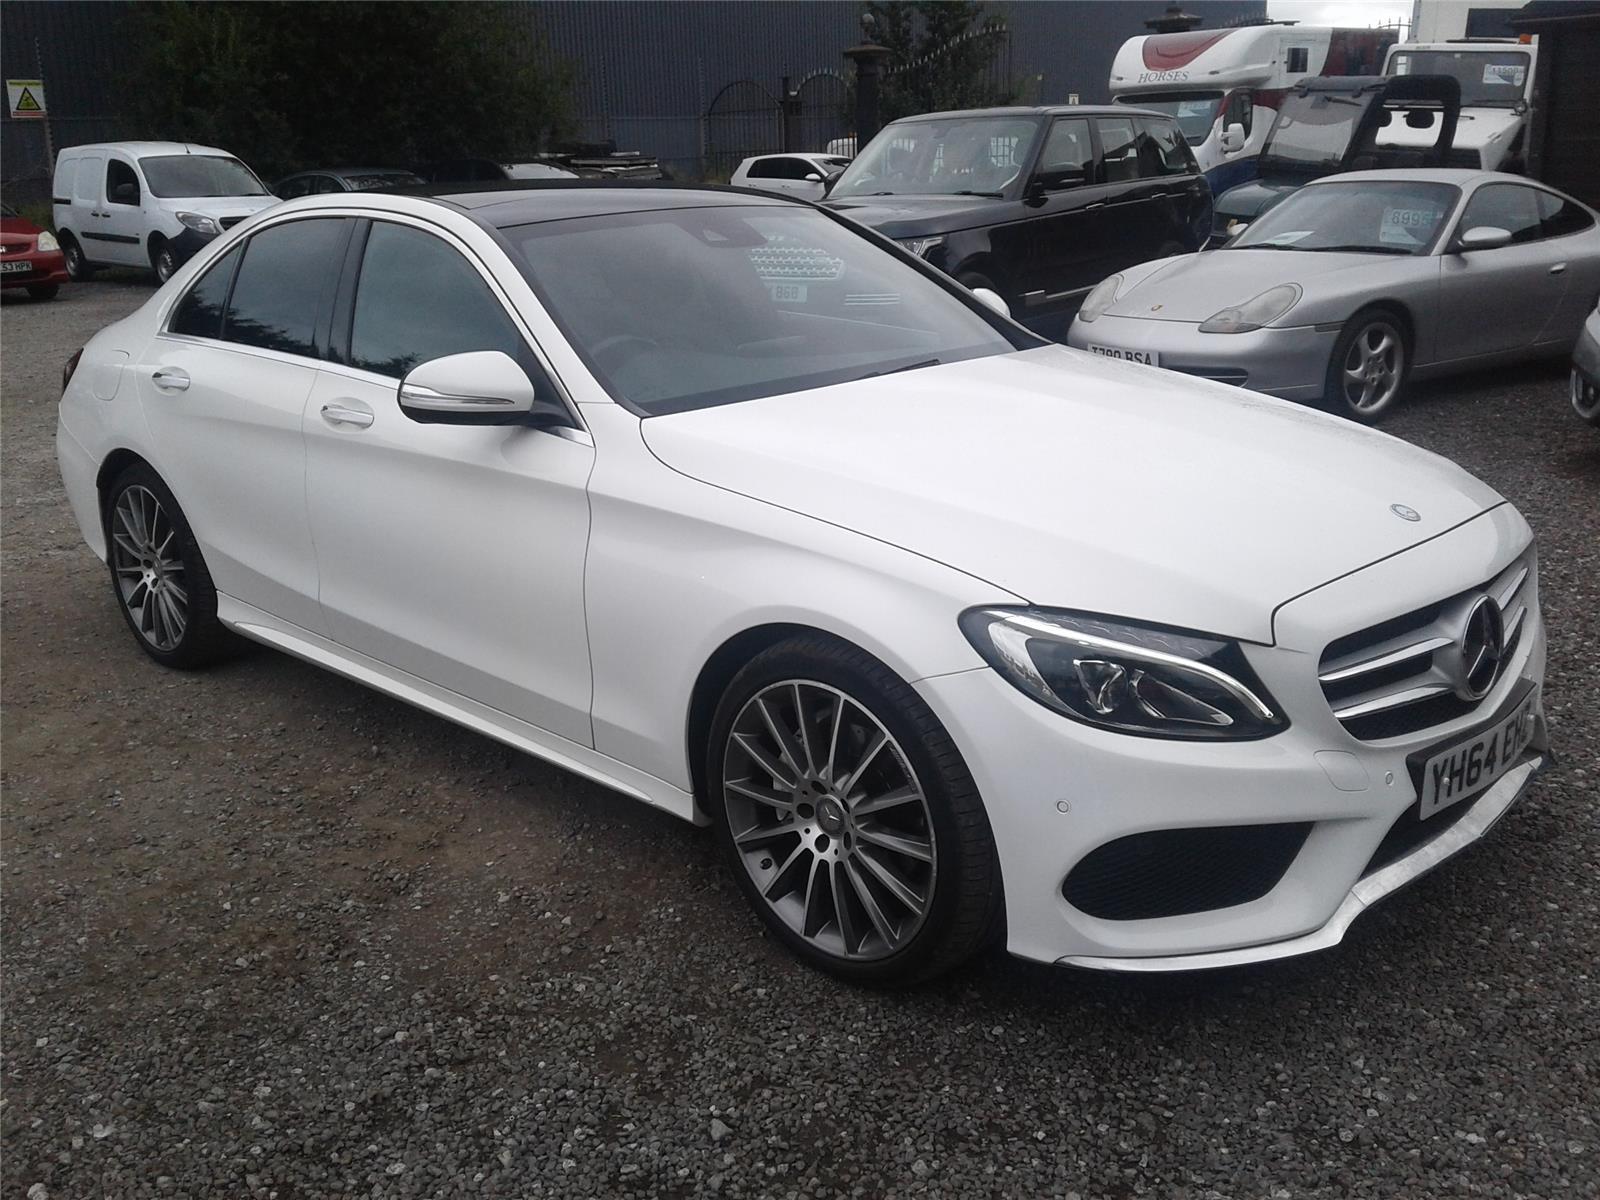 2014 Mercedes-Benz C Class C220 AMG Line Premium Plus Blu 2143 Diesel Automatic 7 Speed 4 Door Saloon